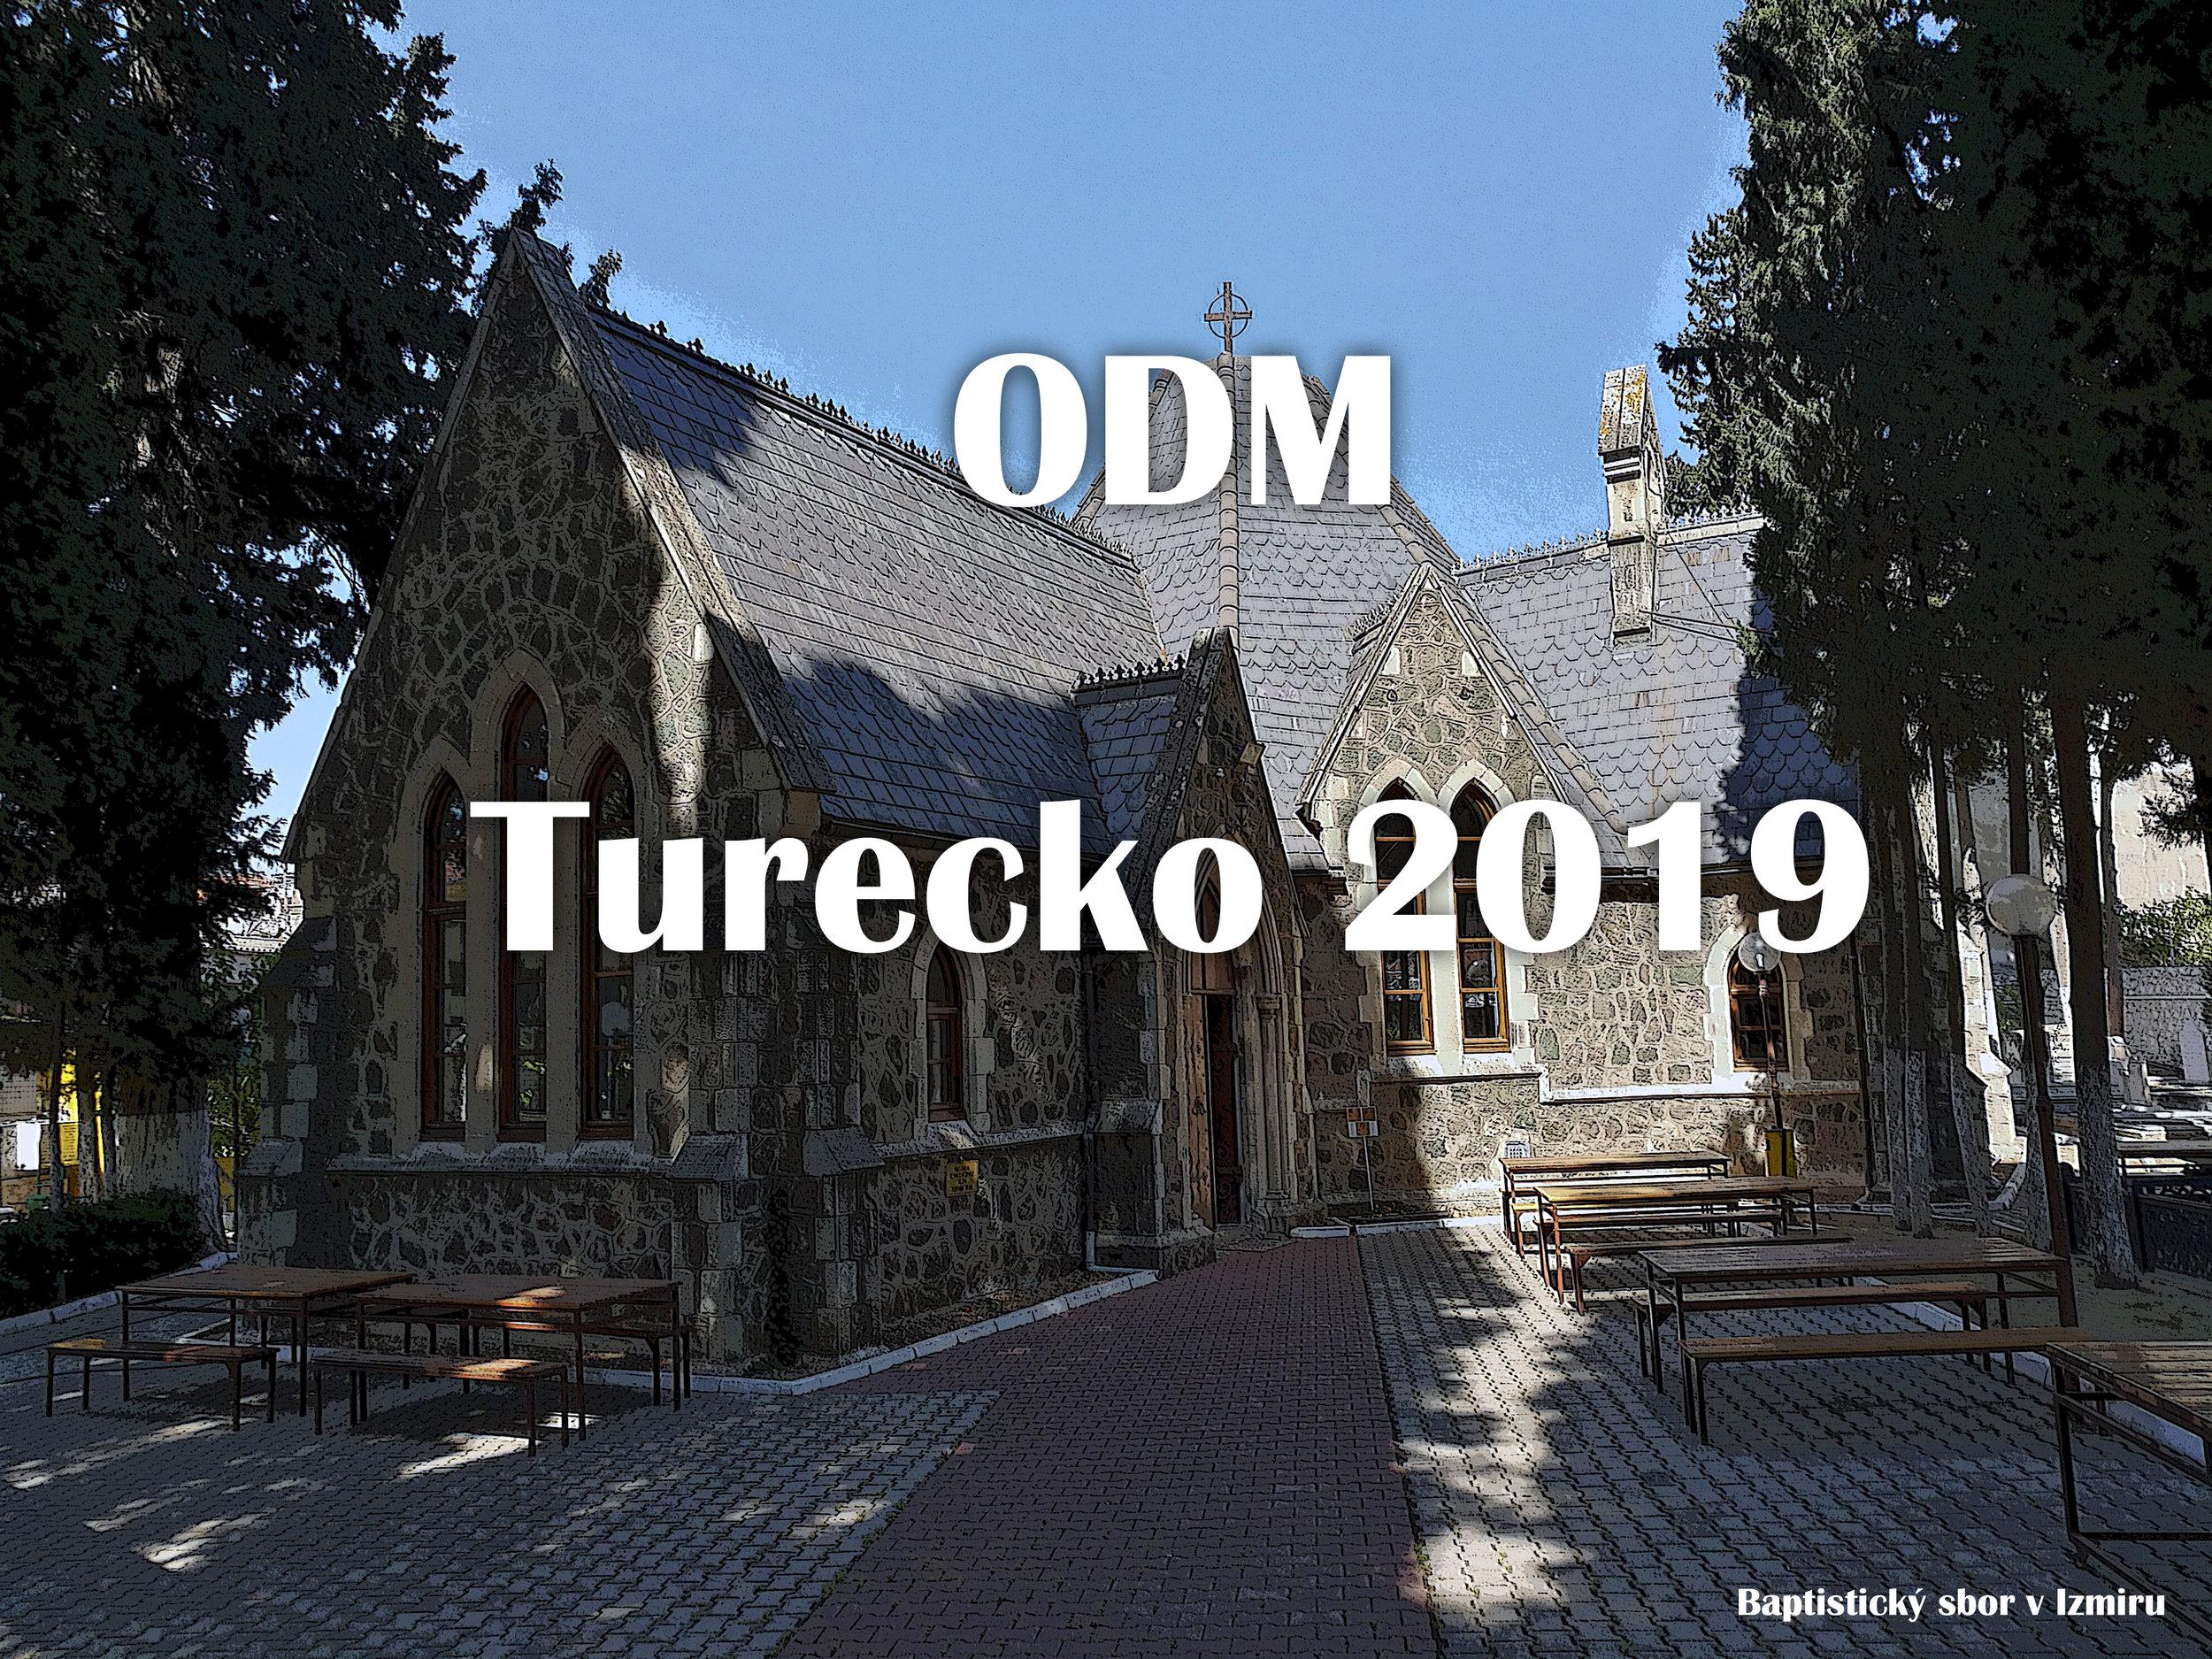 Turecko-2019.jpg